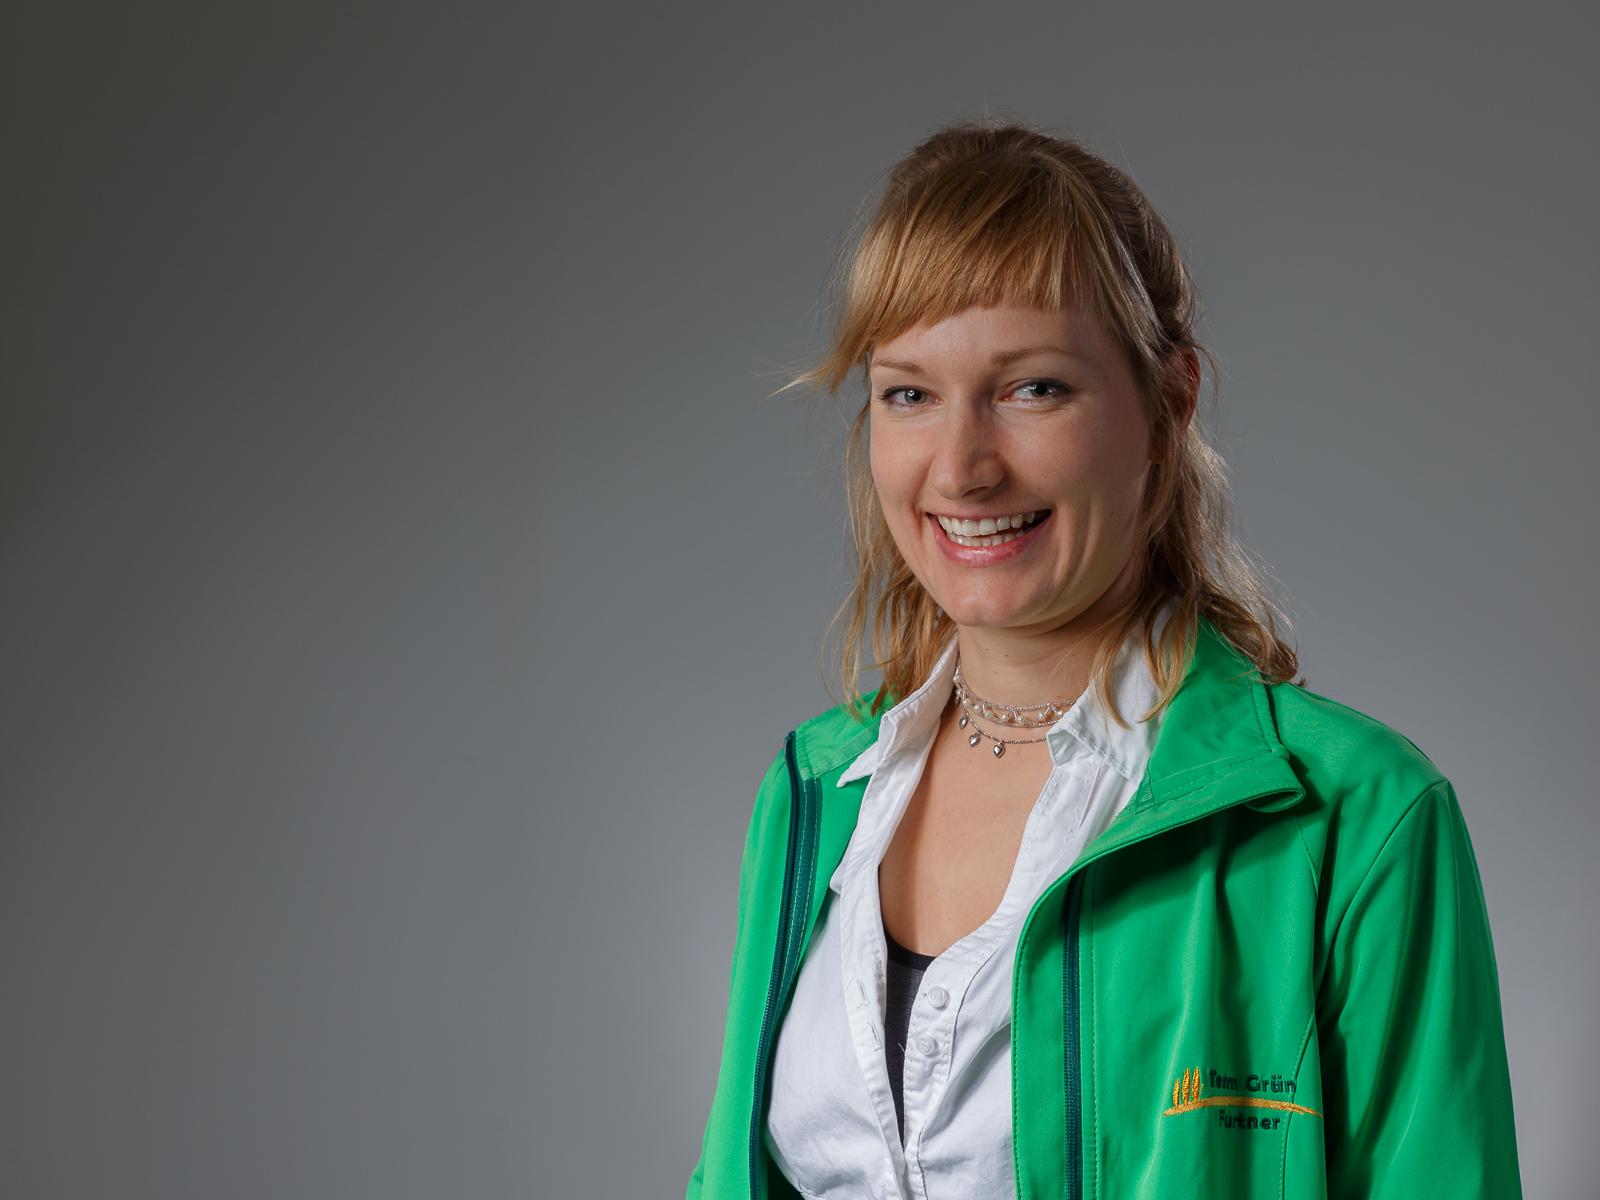 Wanda-Marie Steinhilp